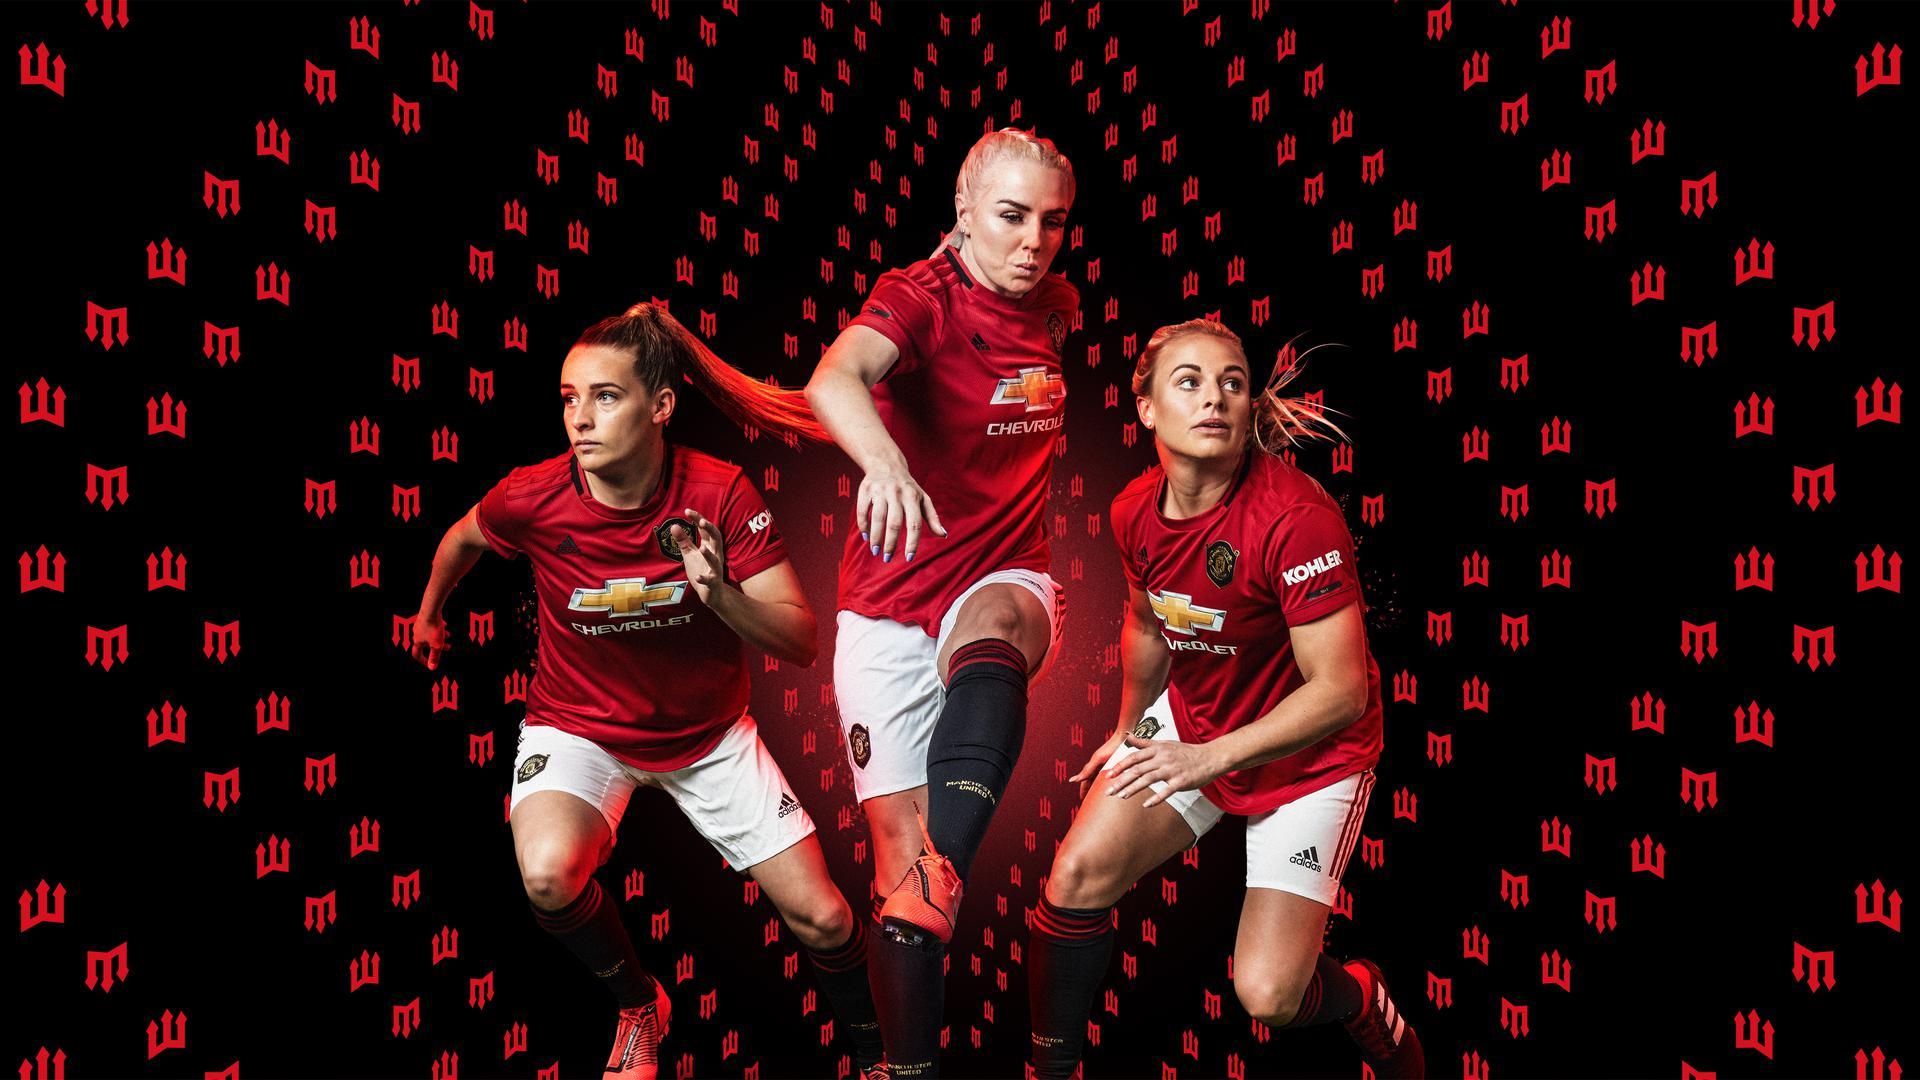 Man Utd Women 2019 20 Wsl Fixtures Released Manchester United